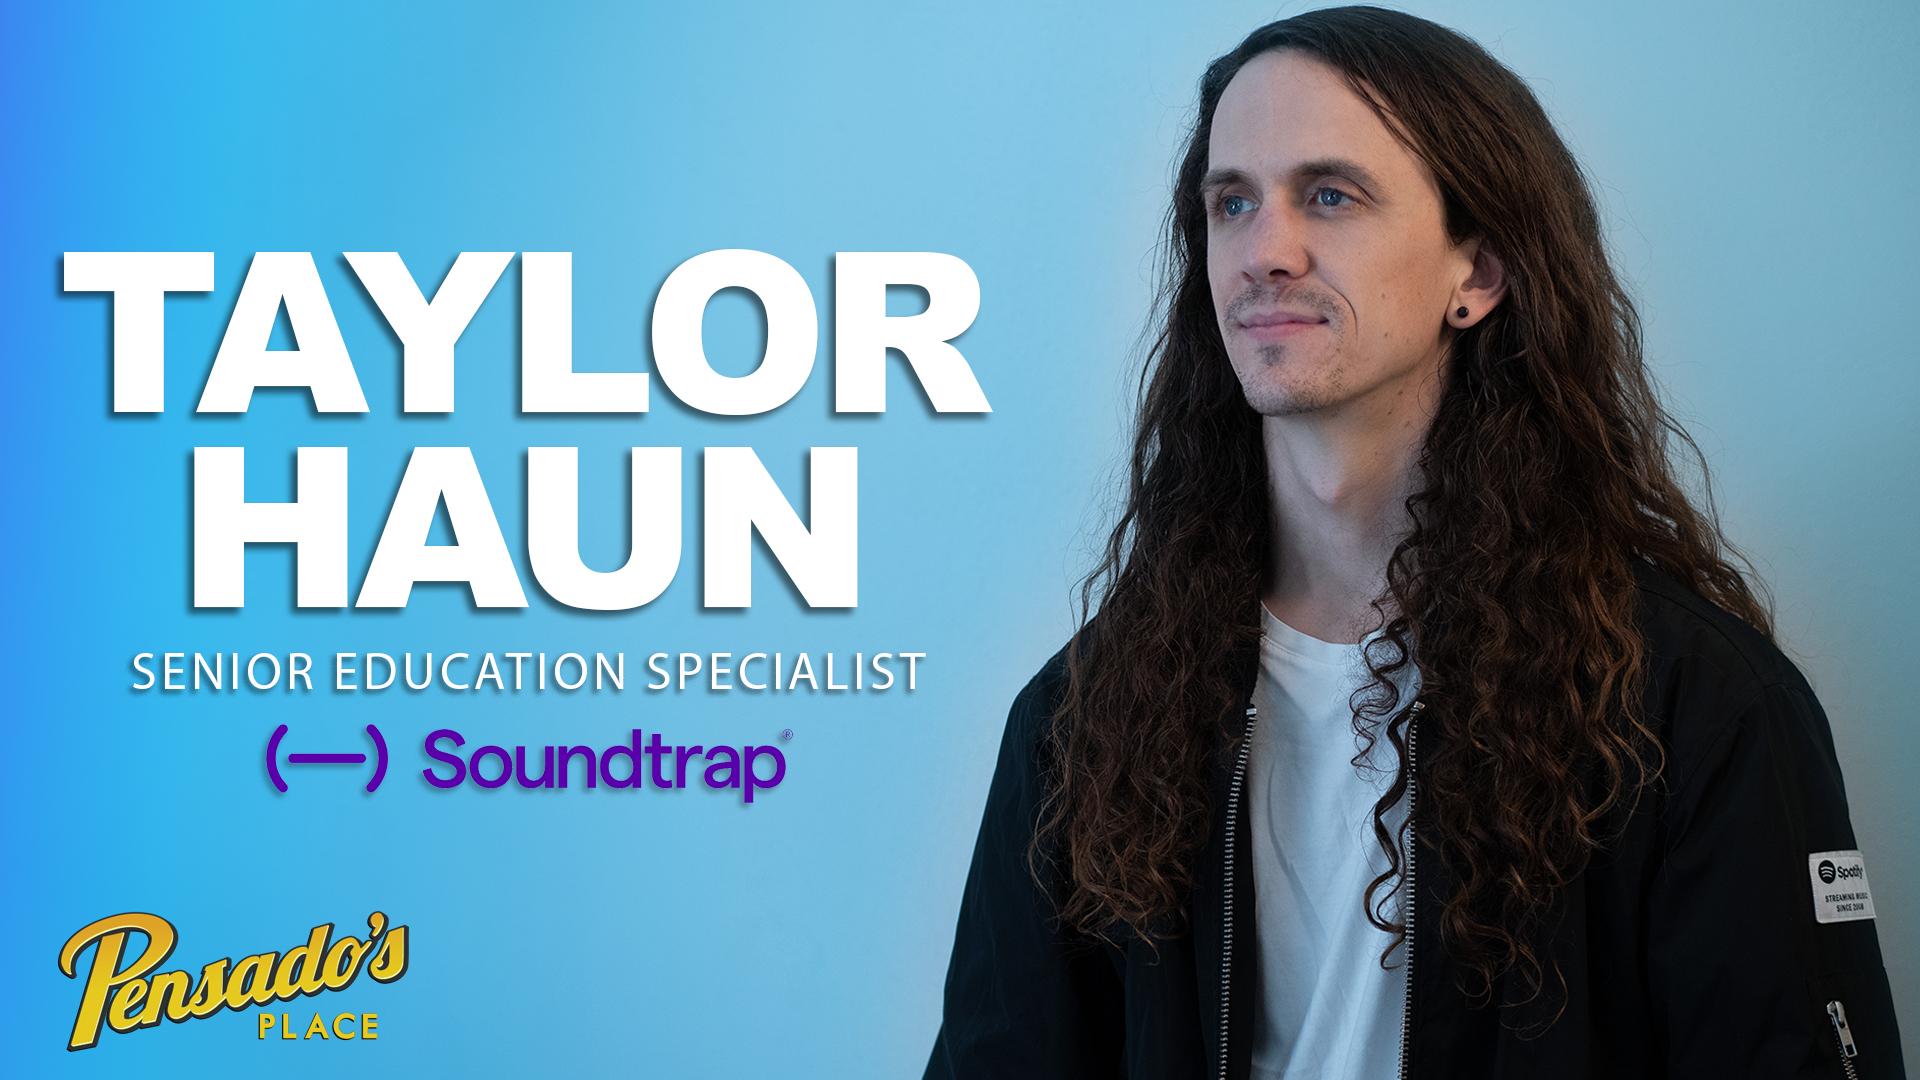 Soundtrap Senior Education Specialist, Taylor Haun